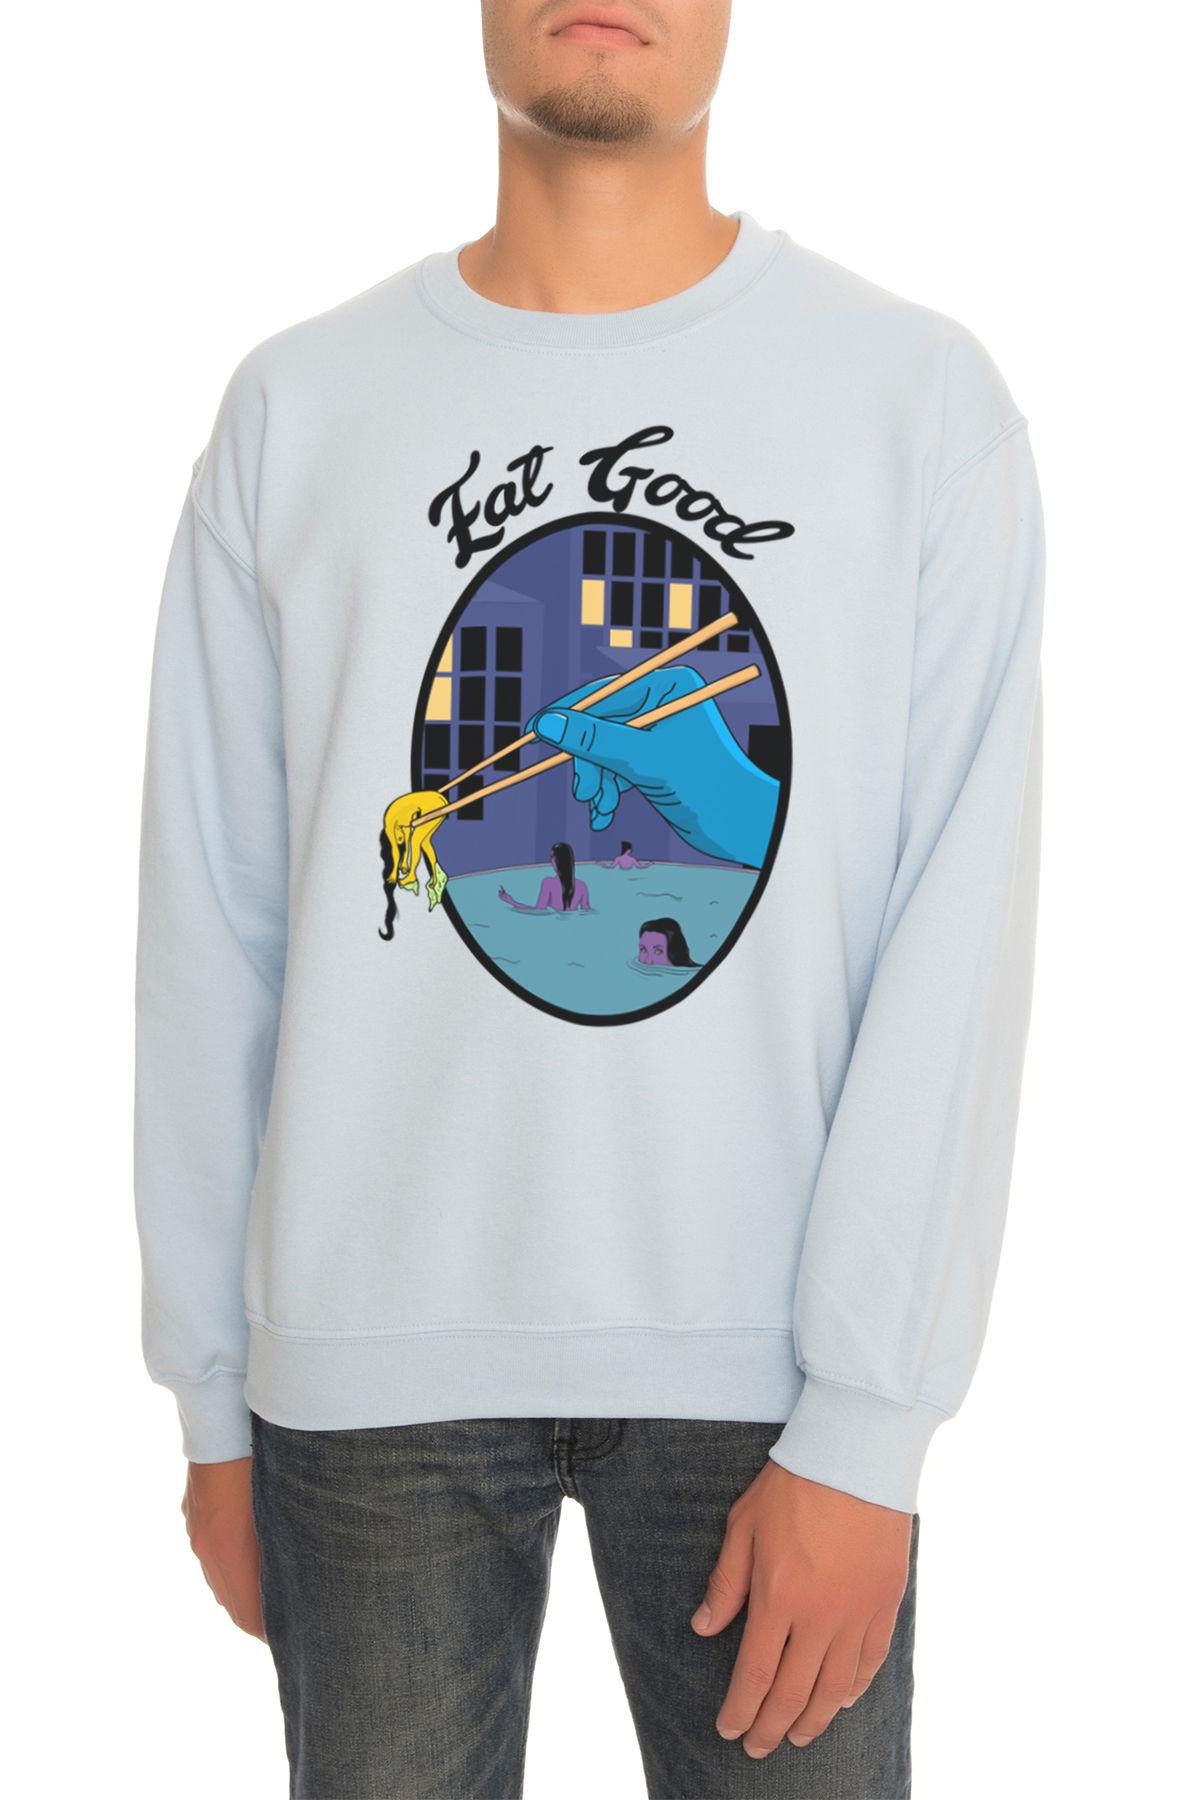 The Sushi Night Crewneck Sweatshirt in Light Blue